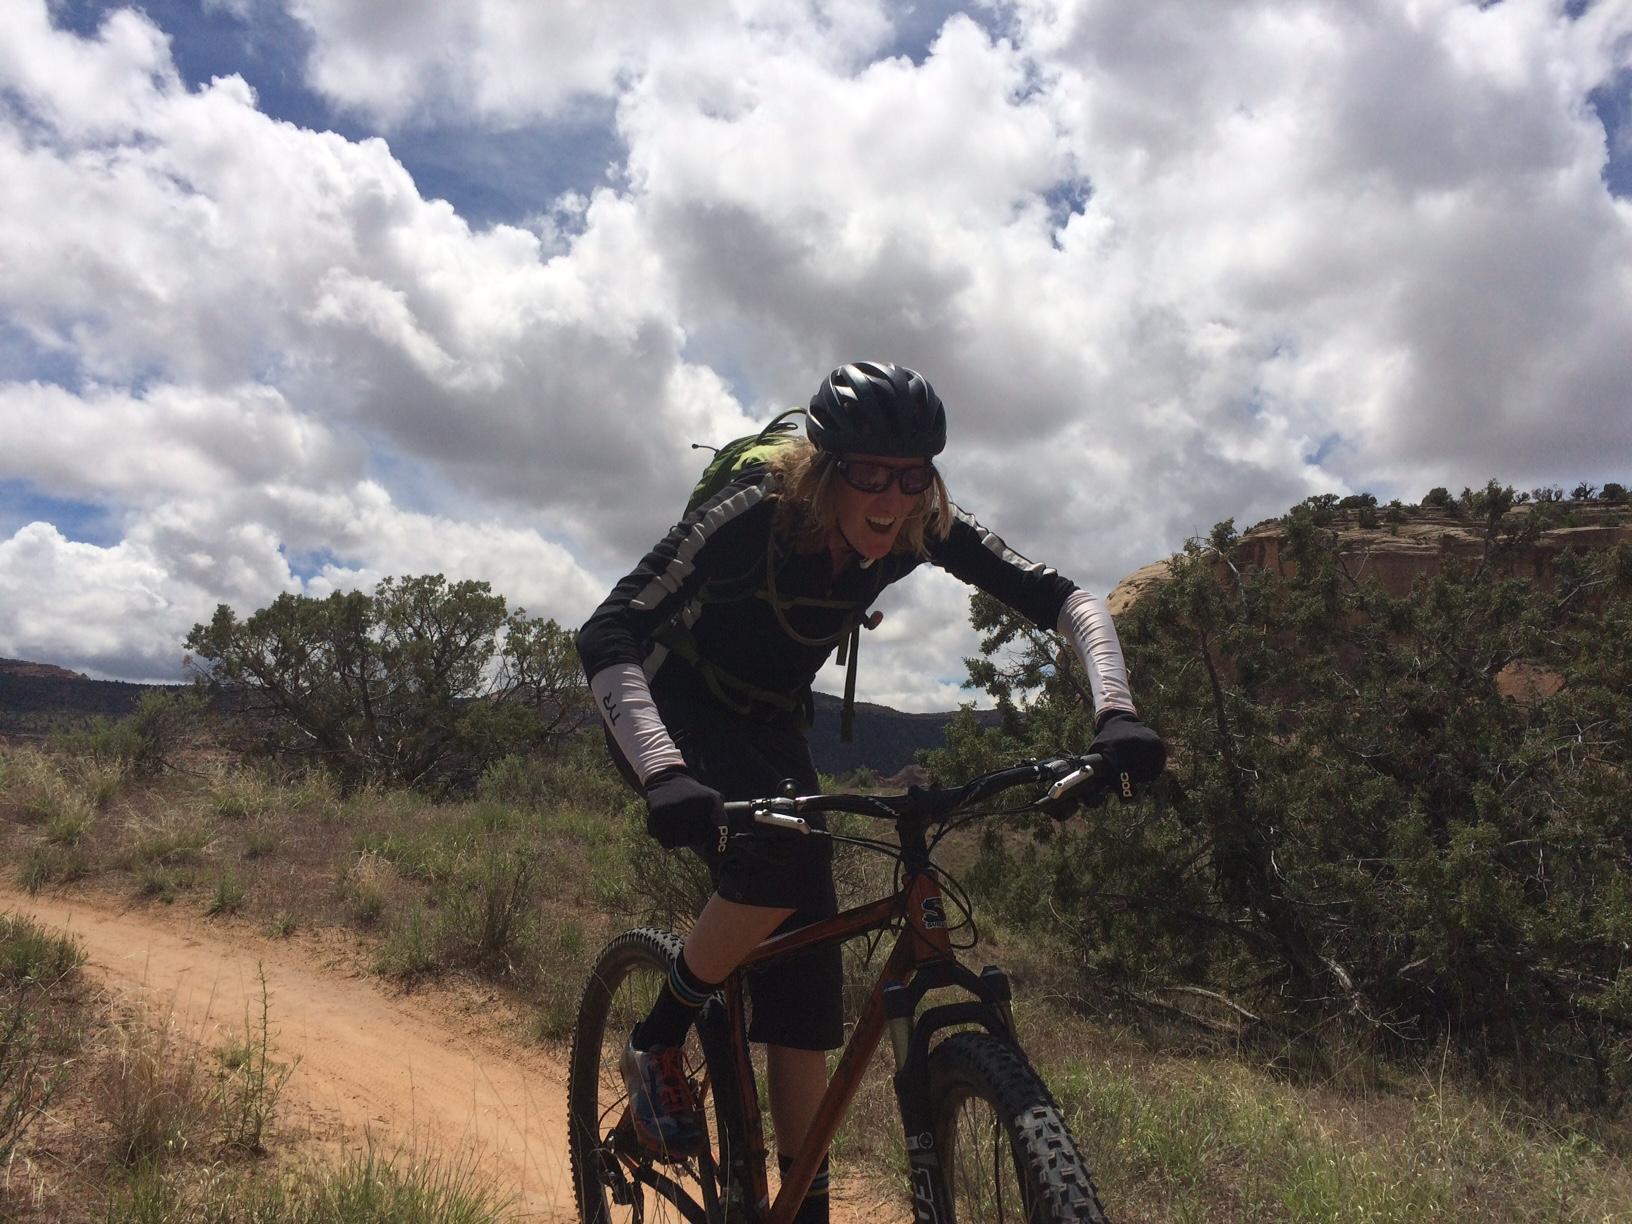 Mountain biking is pretty meh.